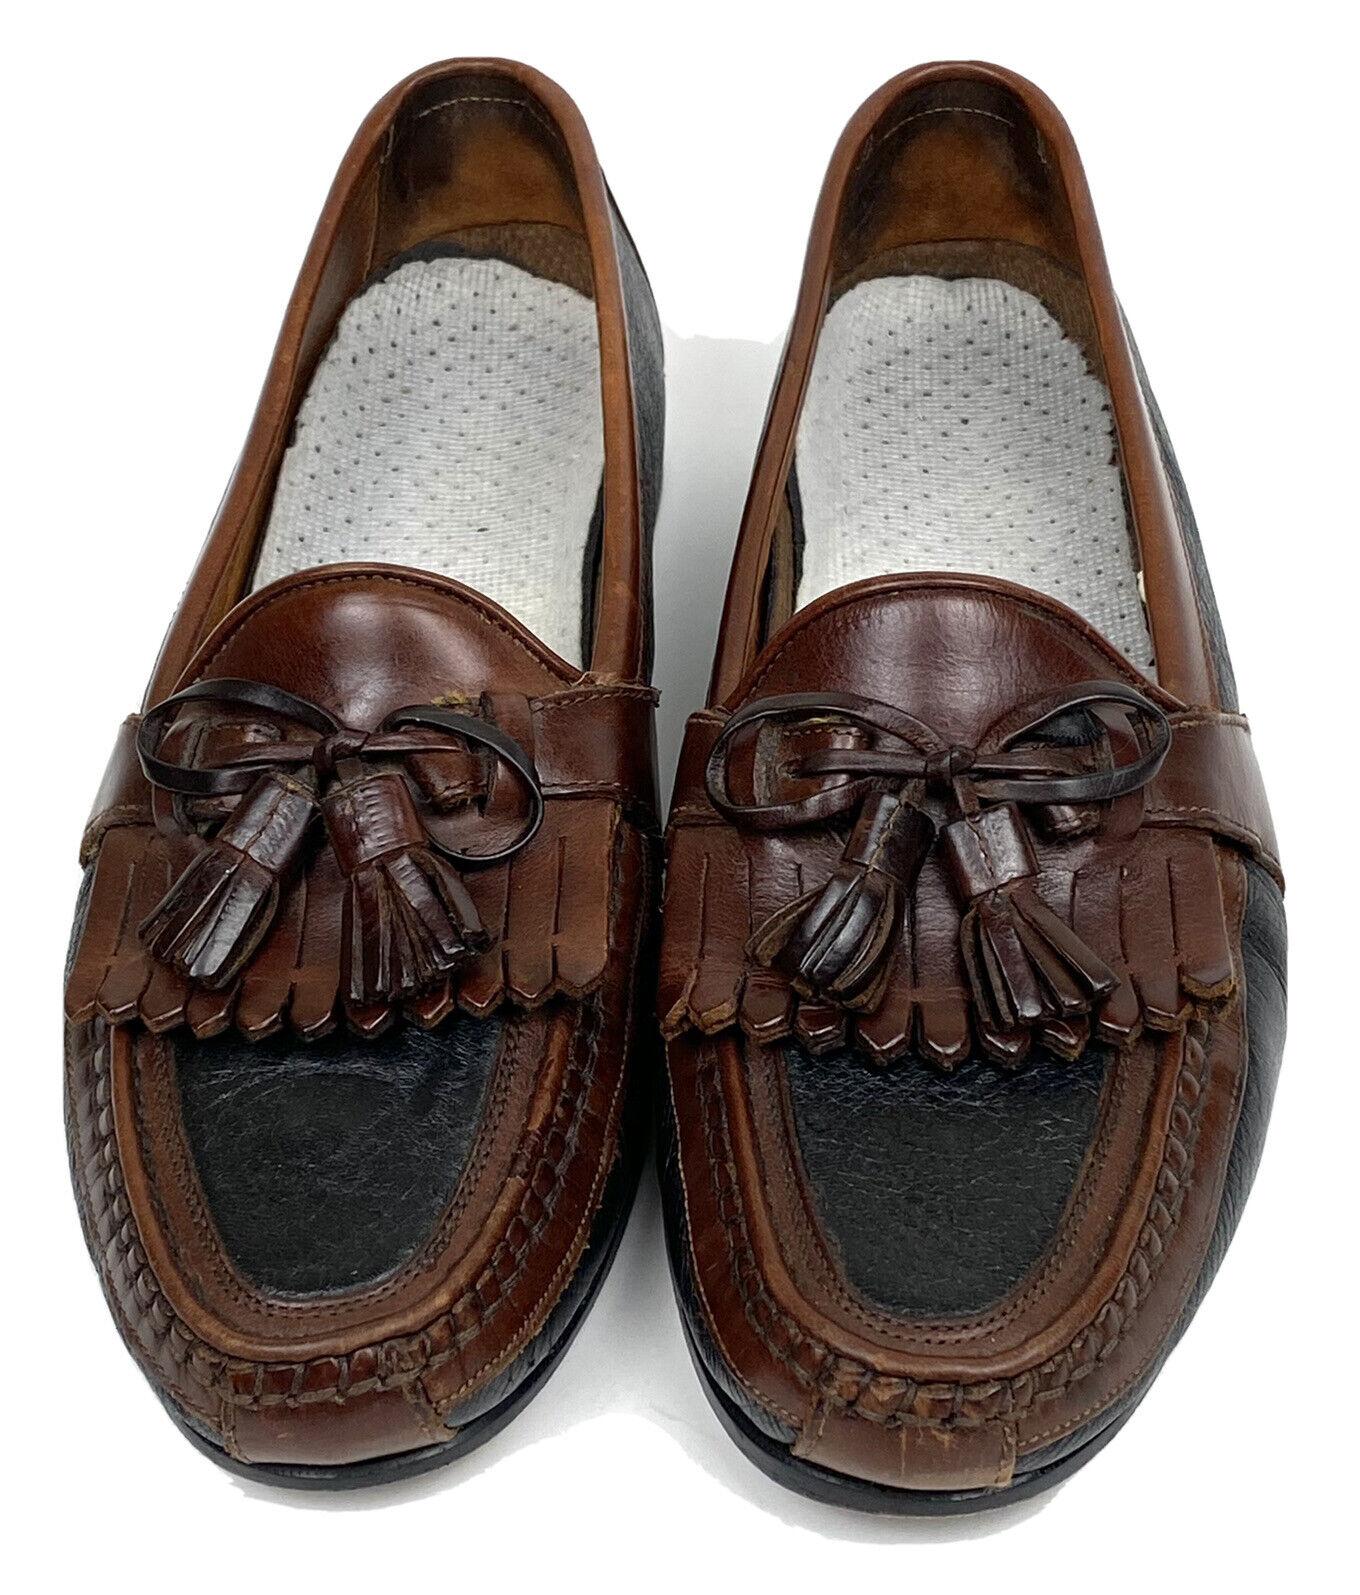 Johnston & Murphy Men's Aragon II Kiltie Tassel Loafer Black / Chestnut 10.5 M